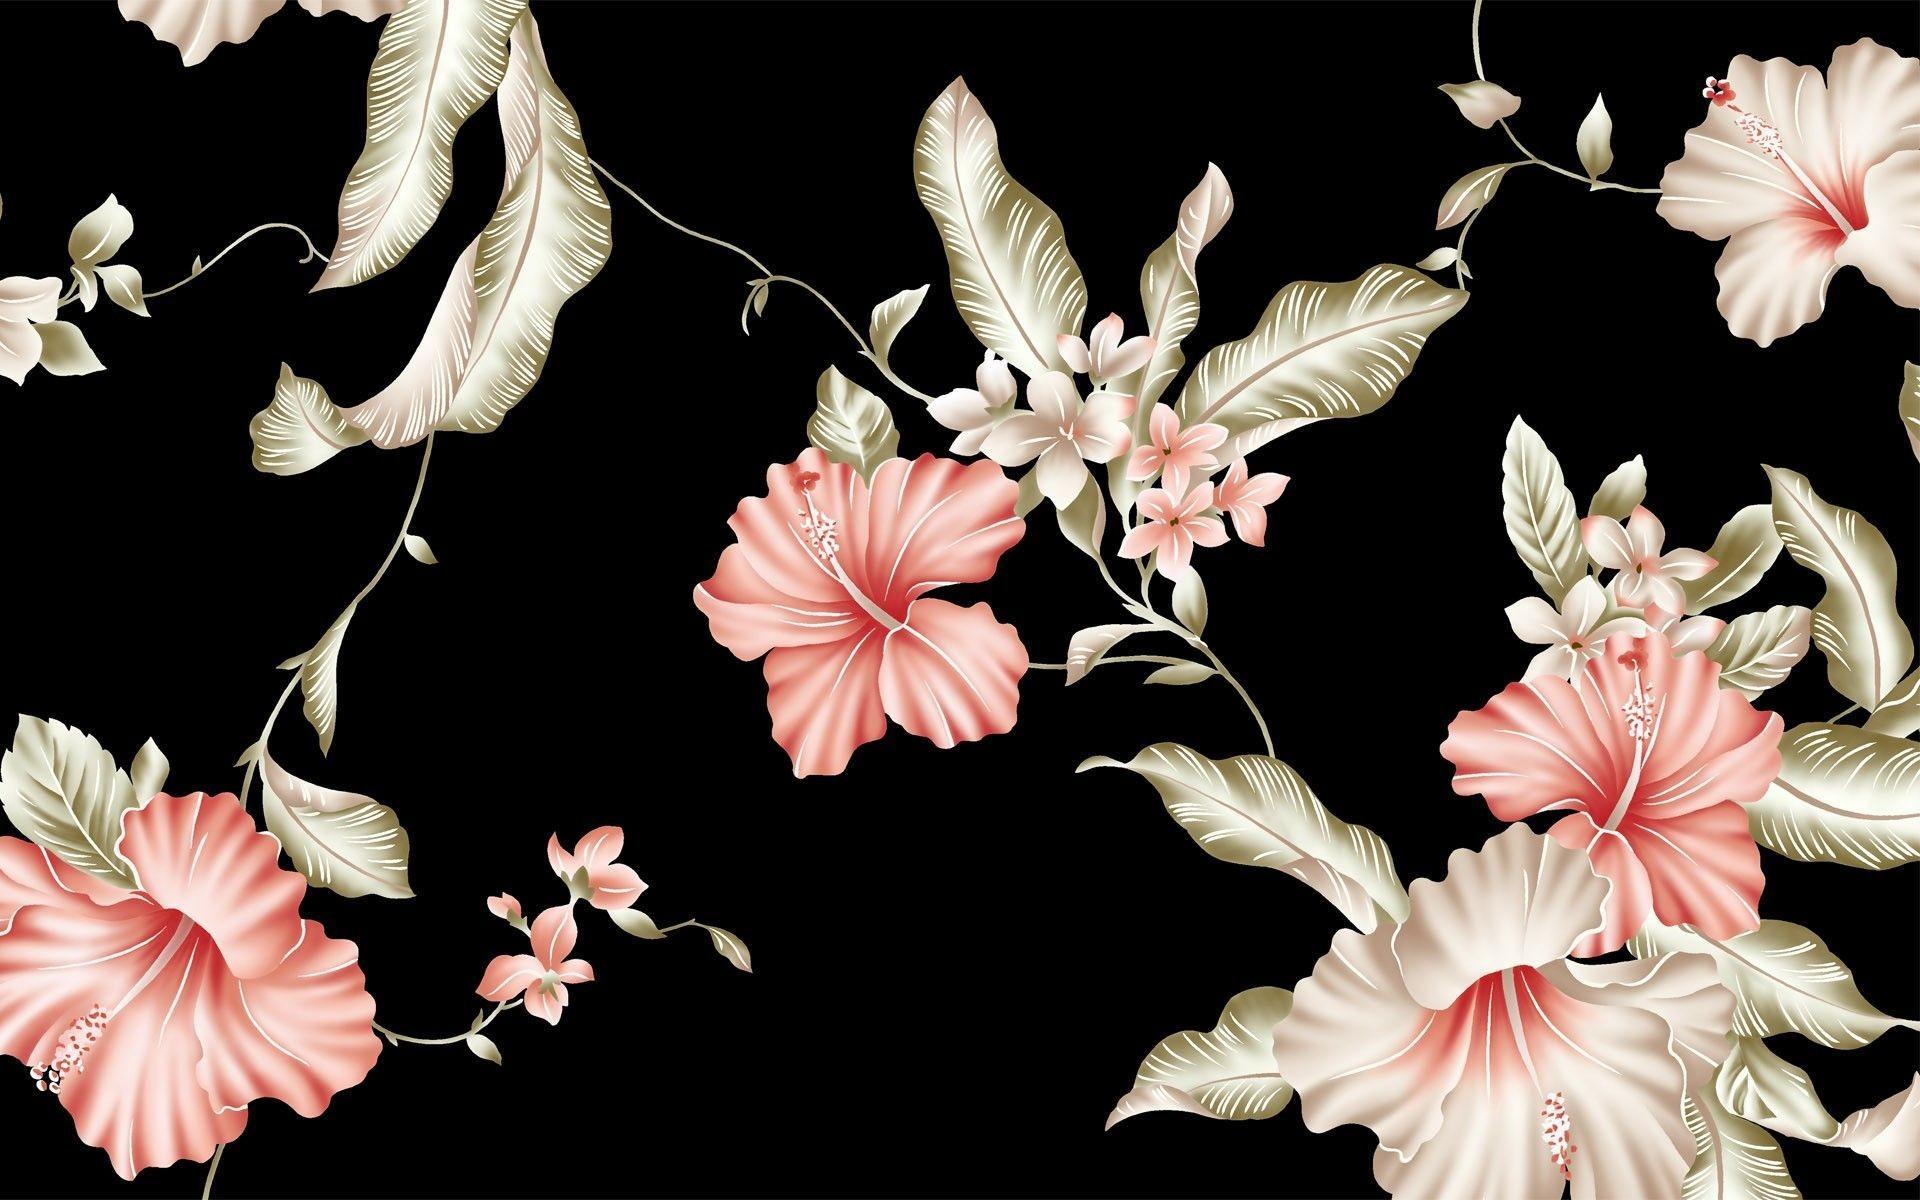 pink flower wallpaper background (55+ images)